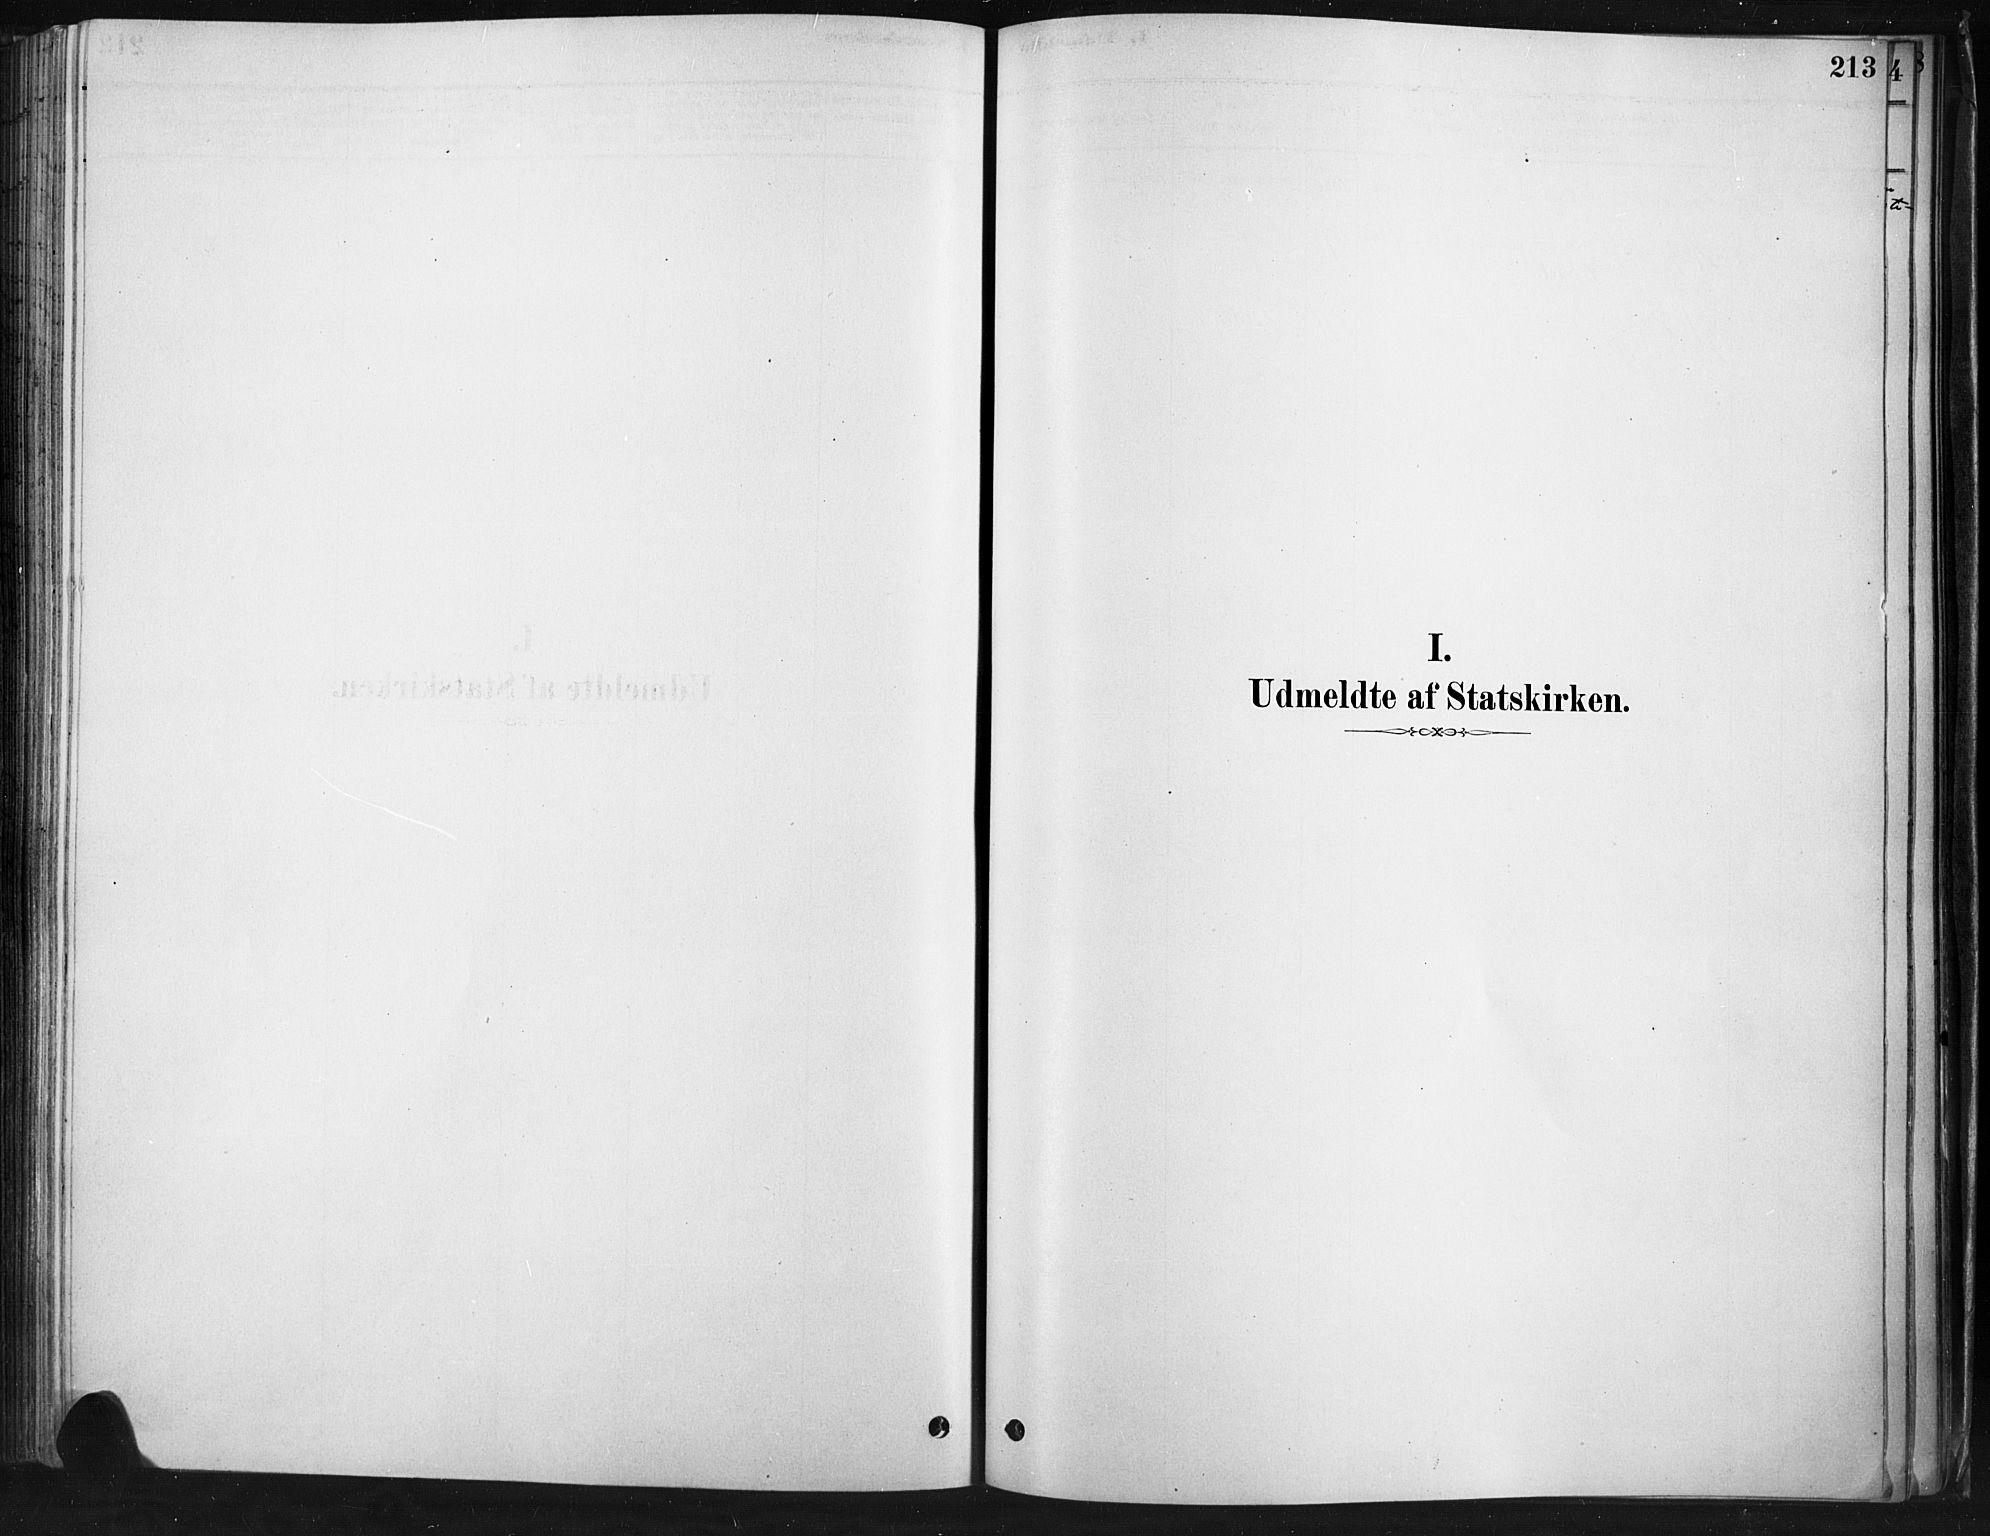 SAH, Ringebu prestekontor, Ministerialbok nr. 9, 1878-1898, s. 213